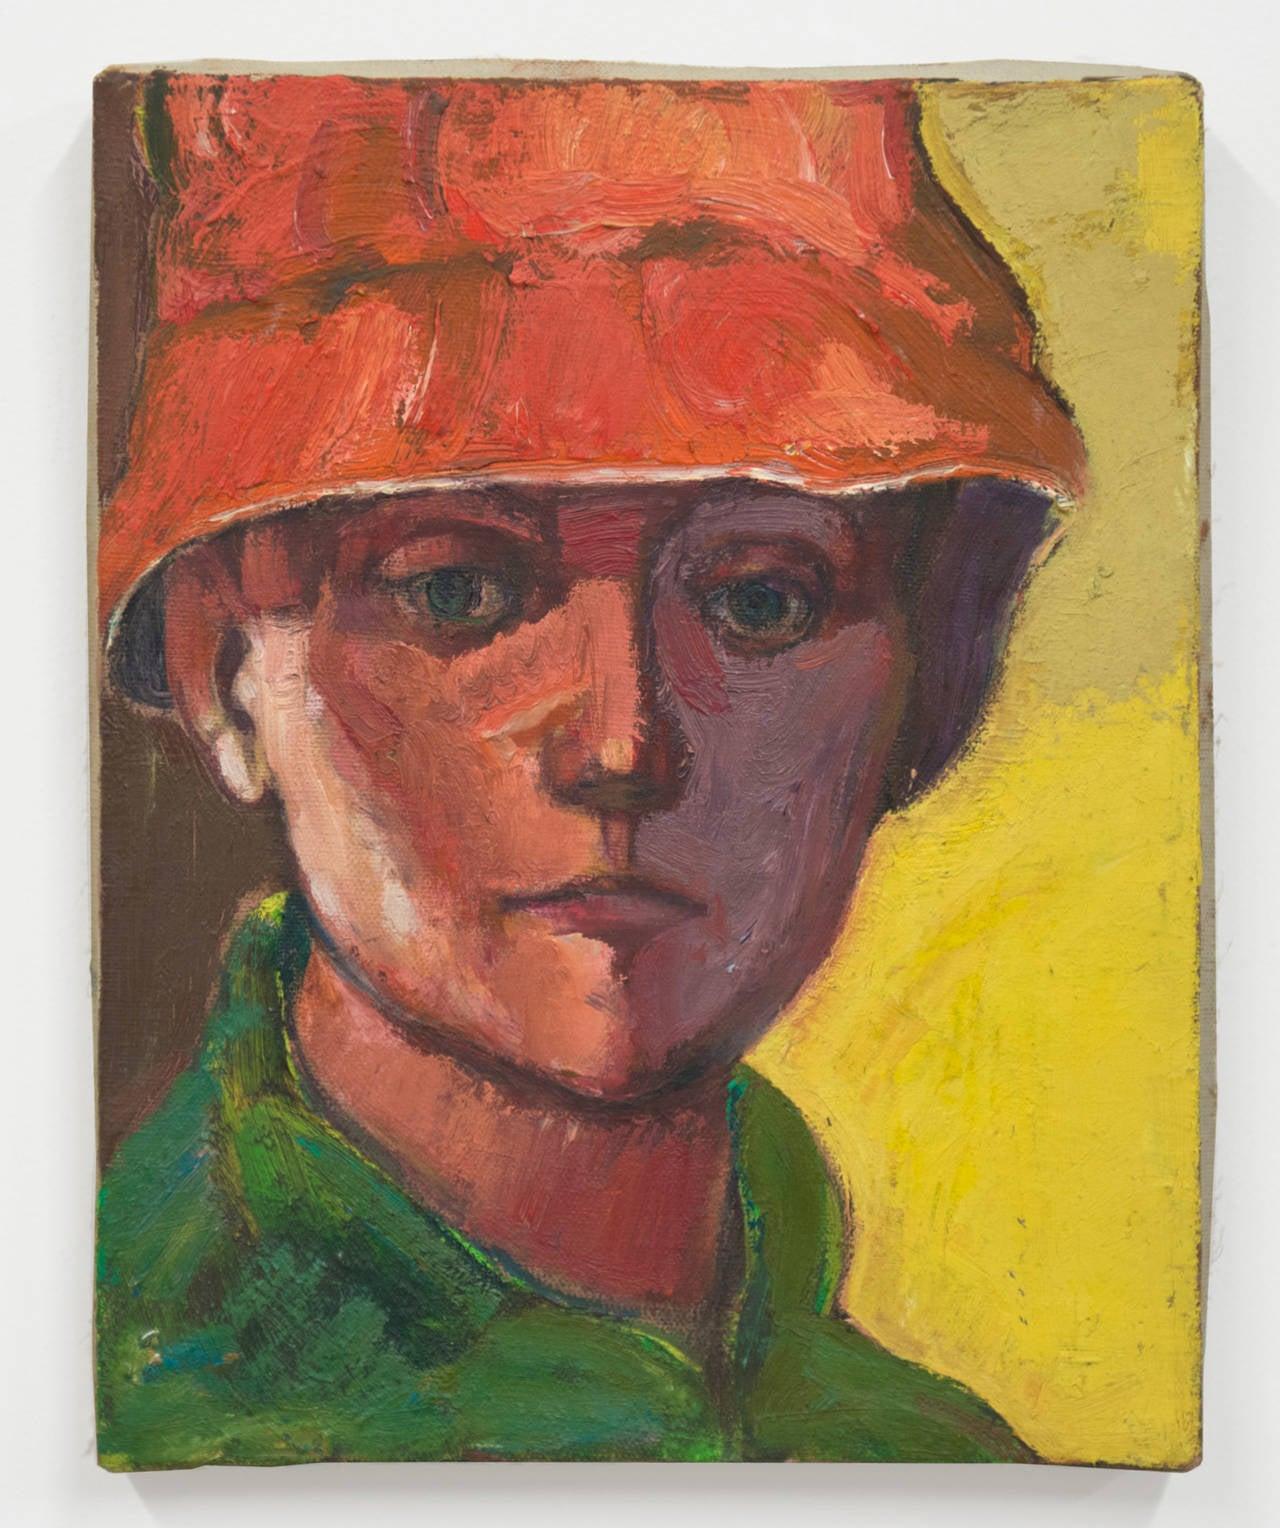 Bernard Chaet Portrait Painting - N